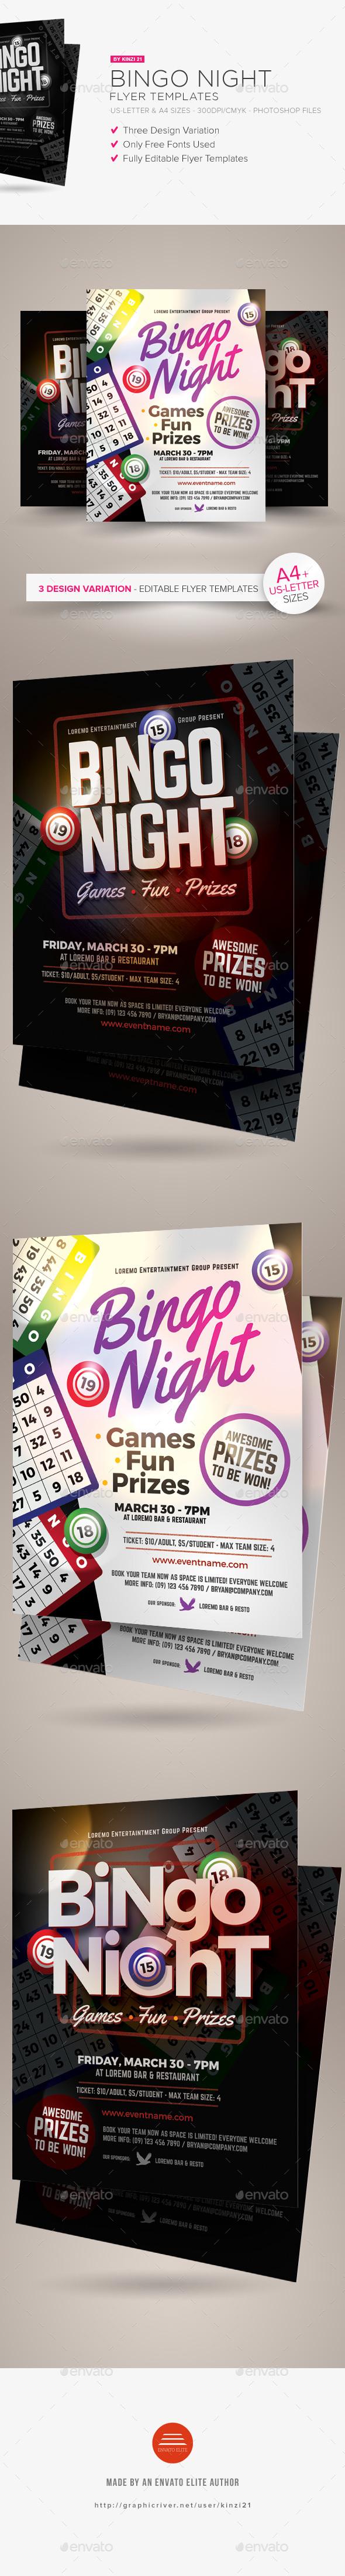 Bingo Night Flyer Templates - Miscellaneous Events